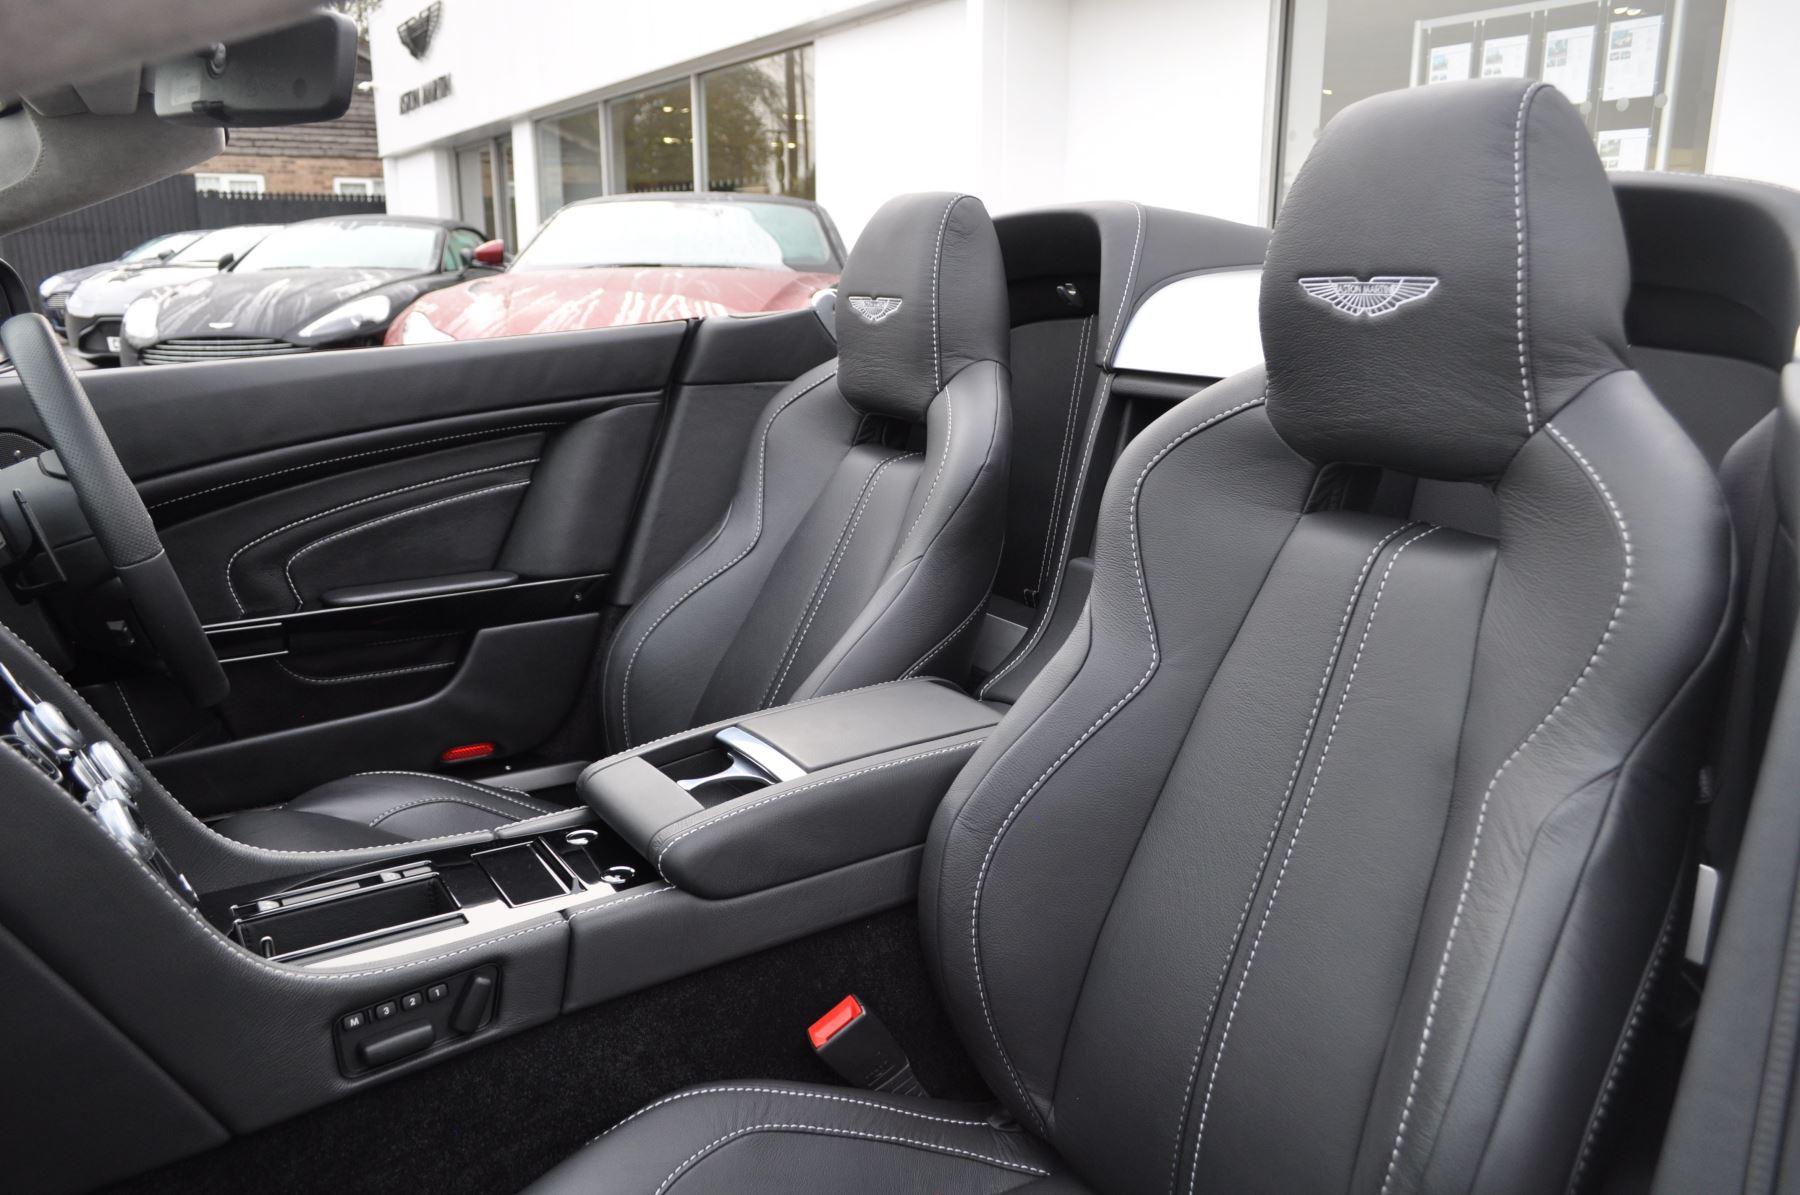 Aston Martin V12 Vantage S S 2dr Sportshift III image 22